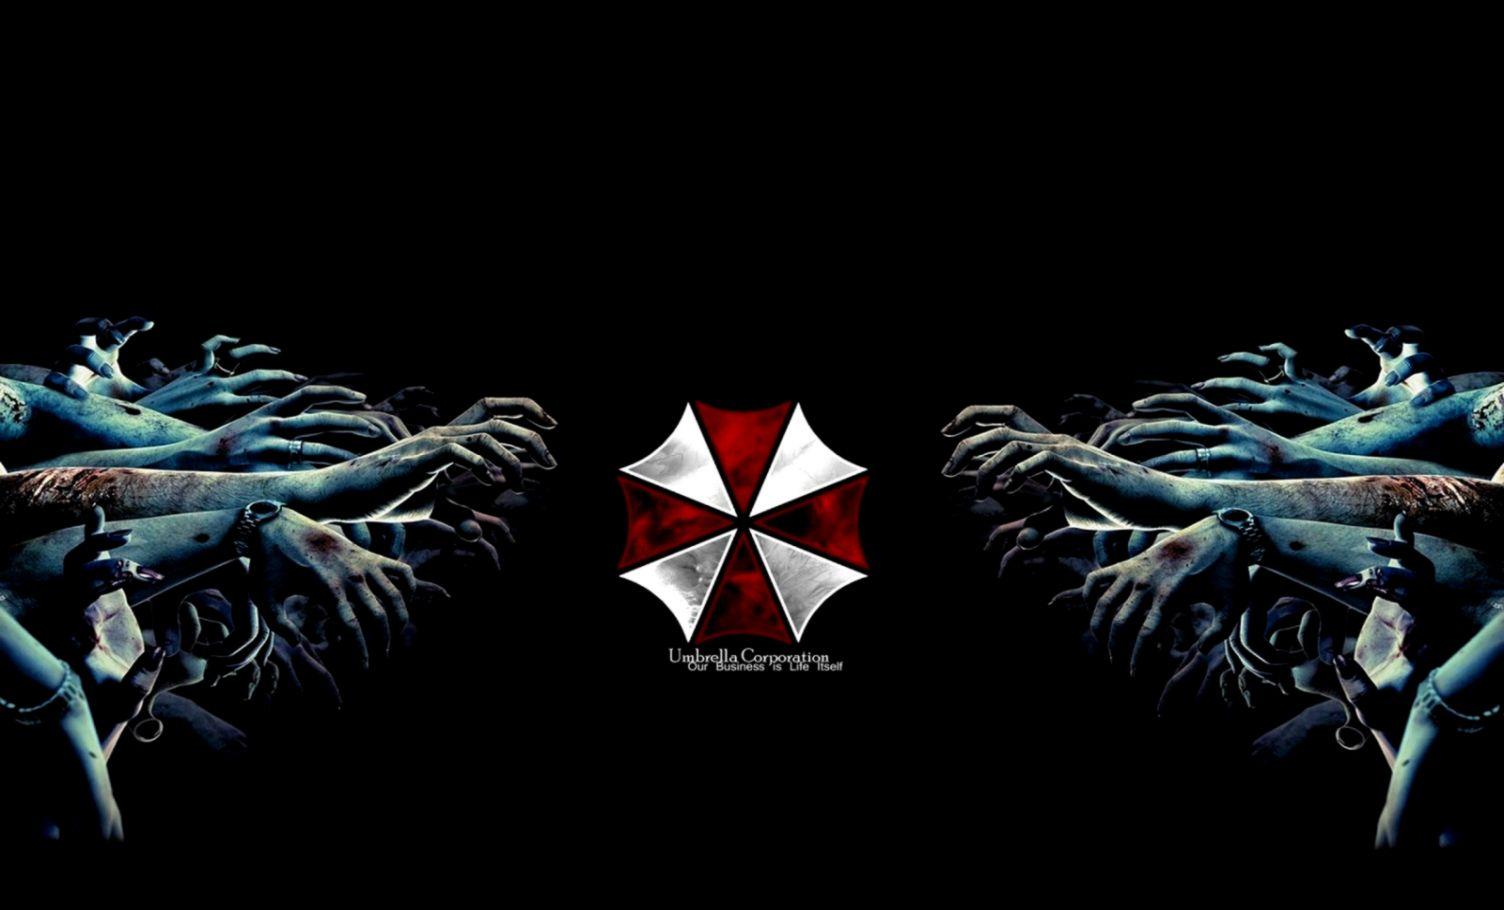 New Resident Evil Hd Wallpaper Wallpapers Desktop